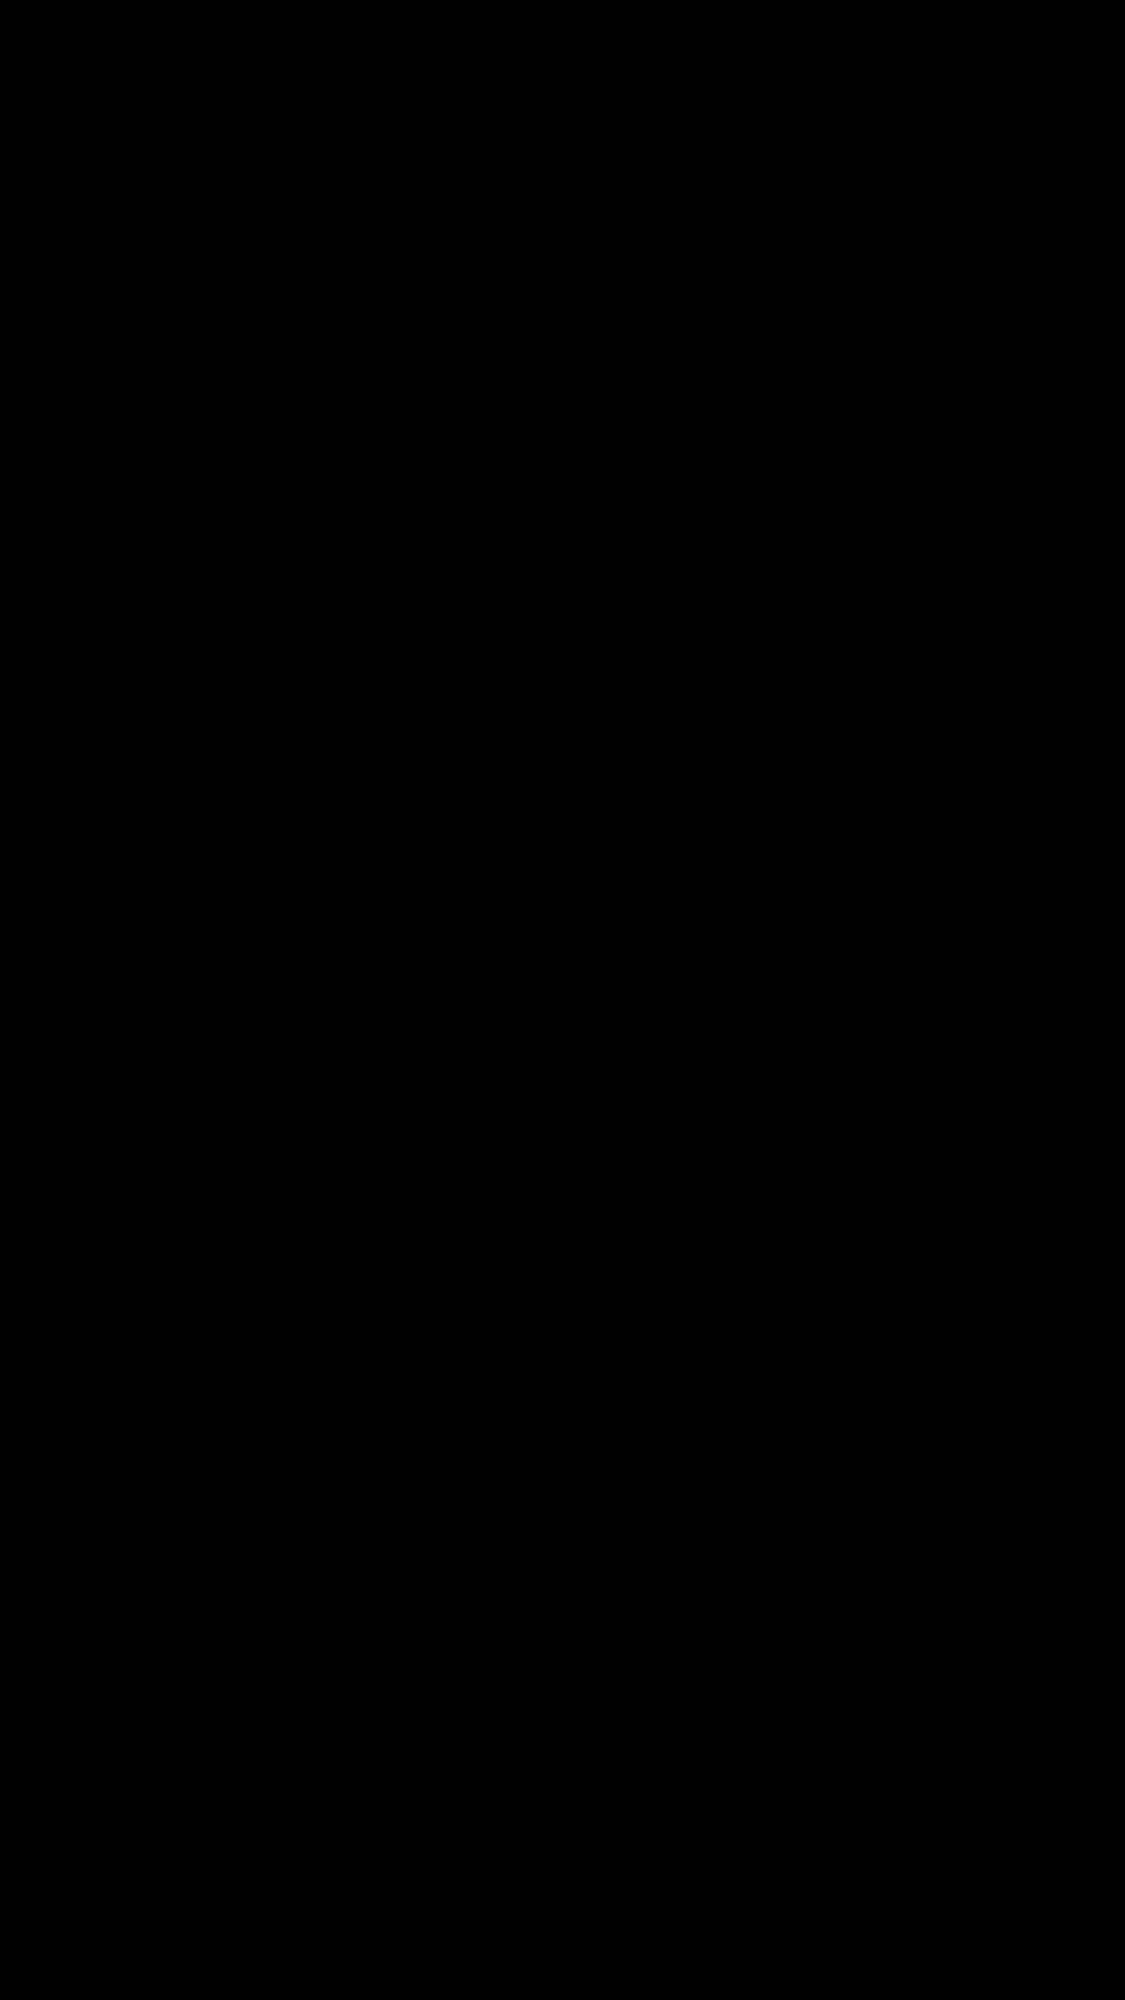 9FFB5EBA-DA73-4797-A548-6BAACB3FB7C6